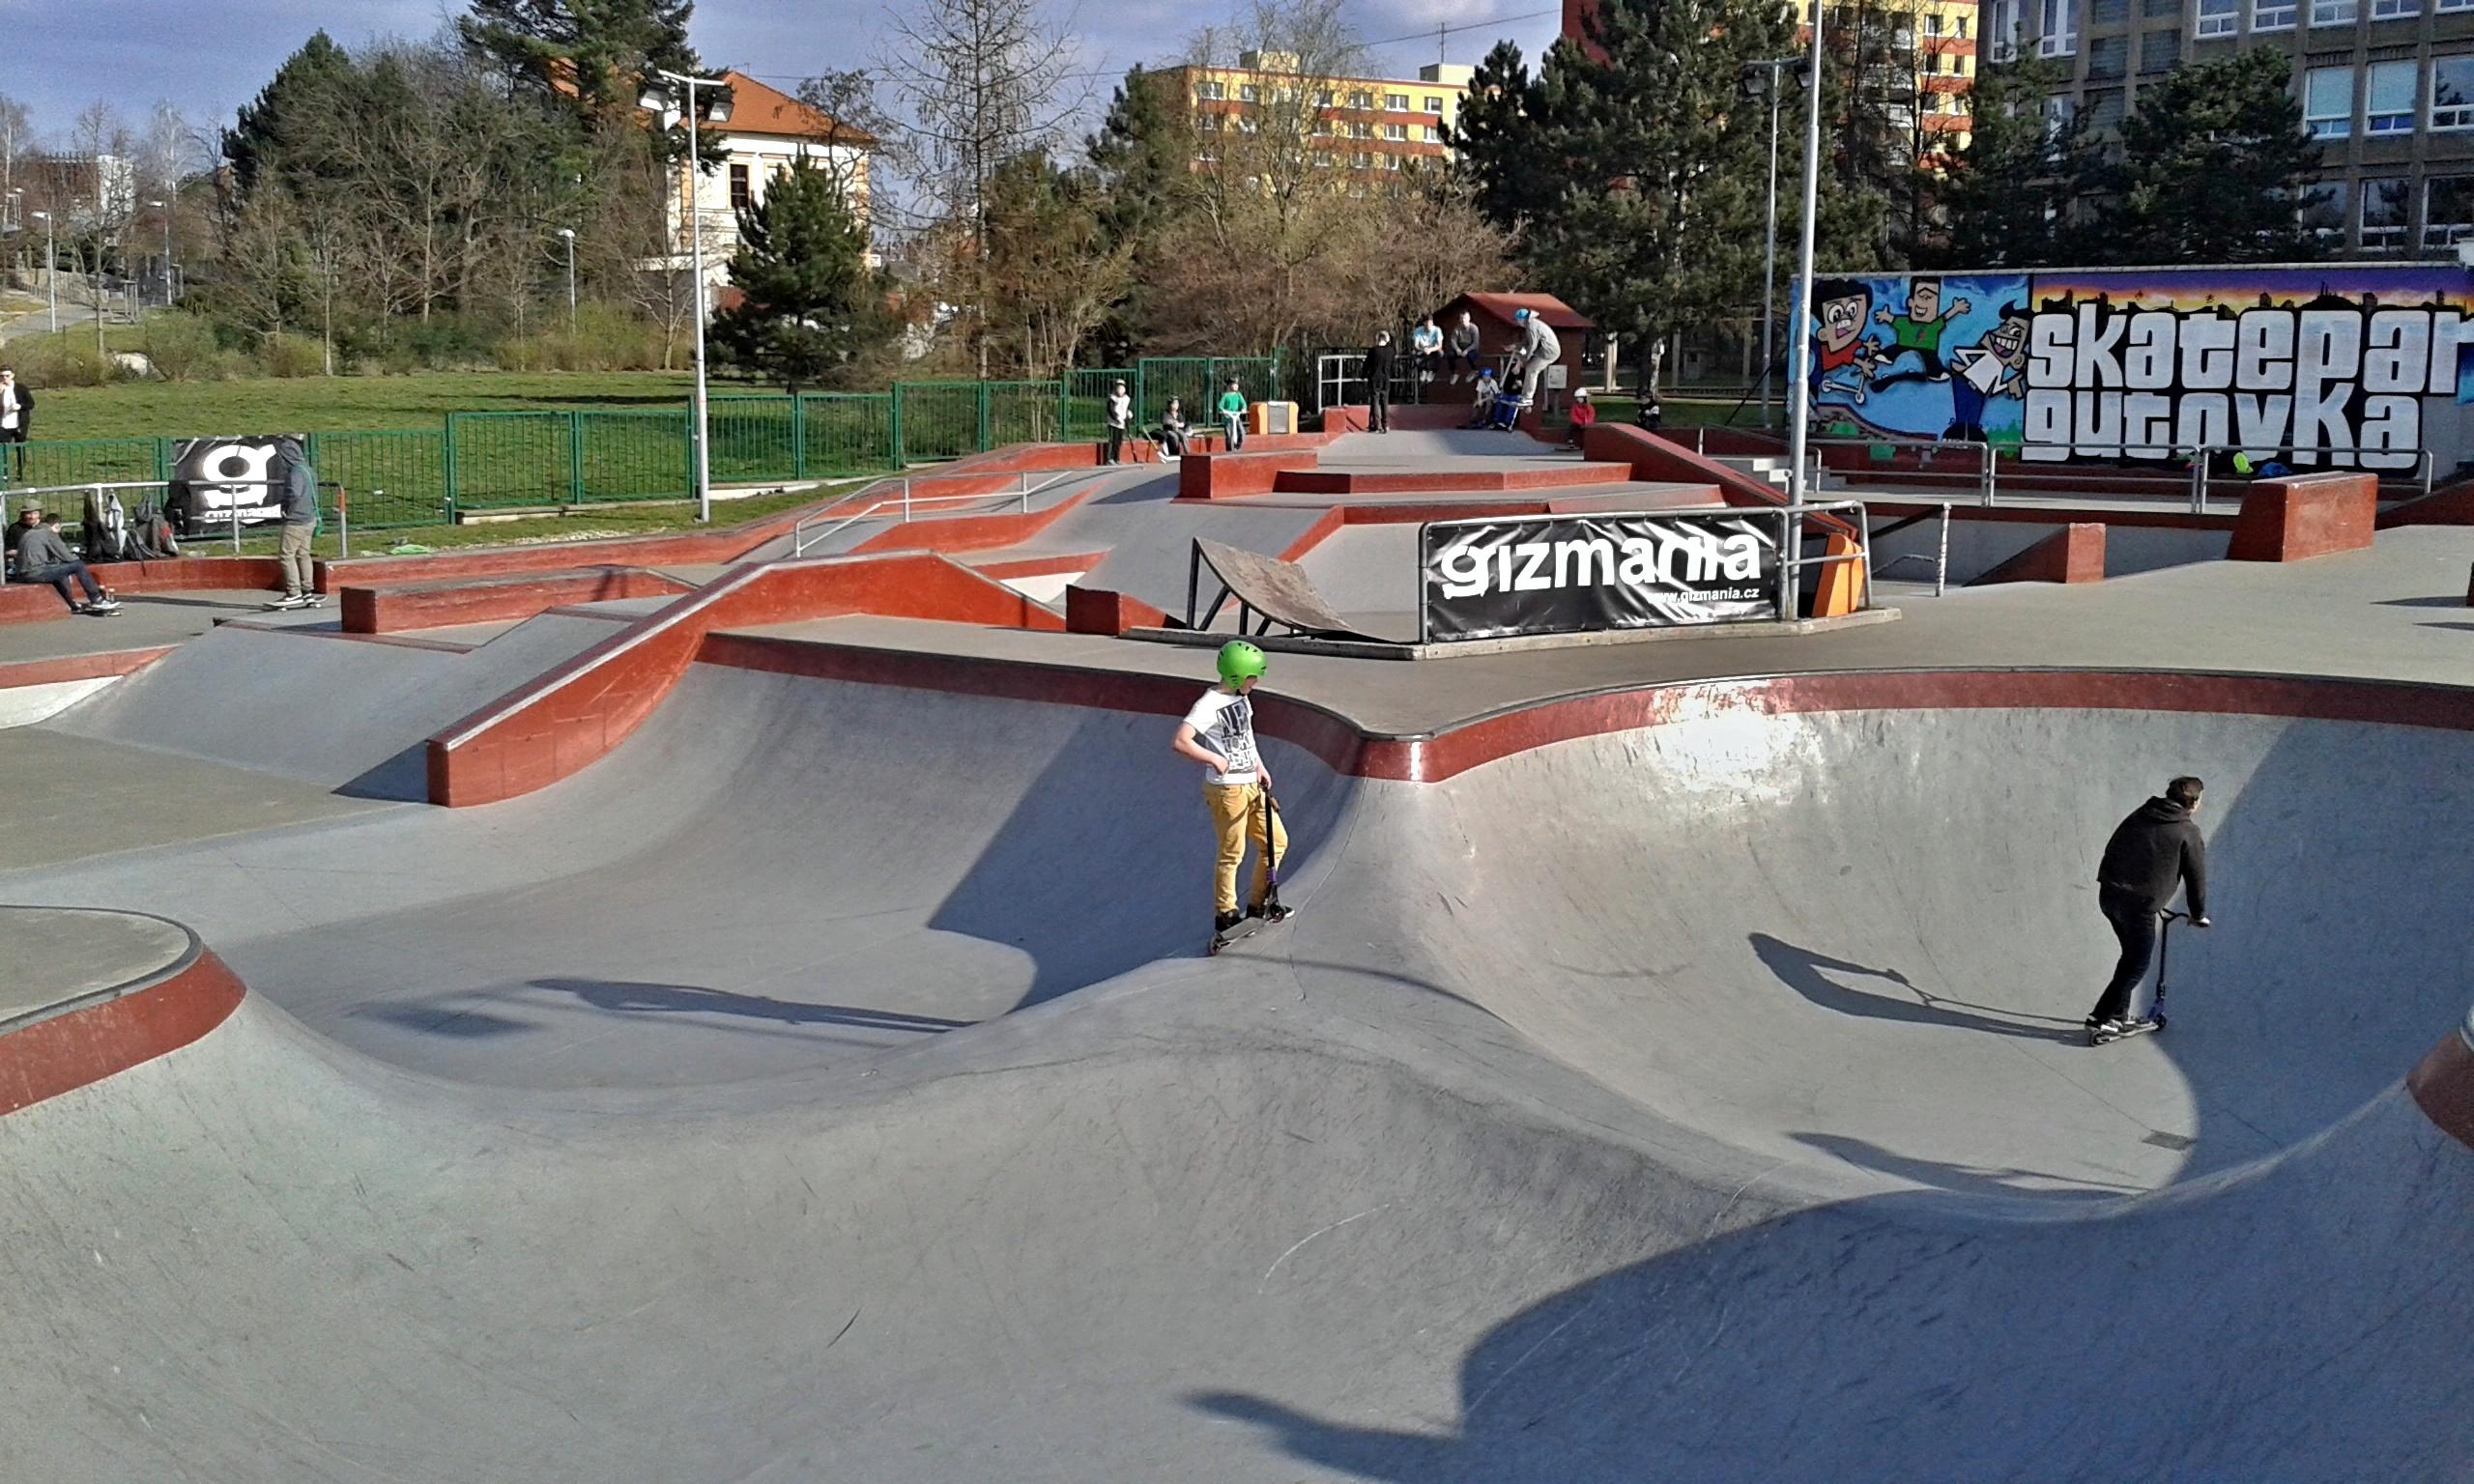 Crawfordsville In Skatepark On It's Way